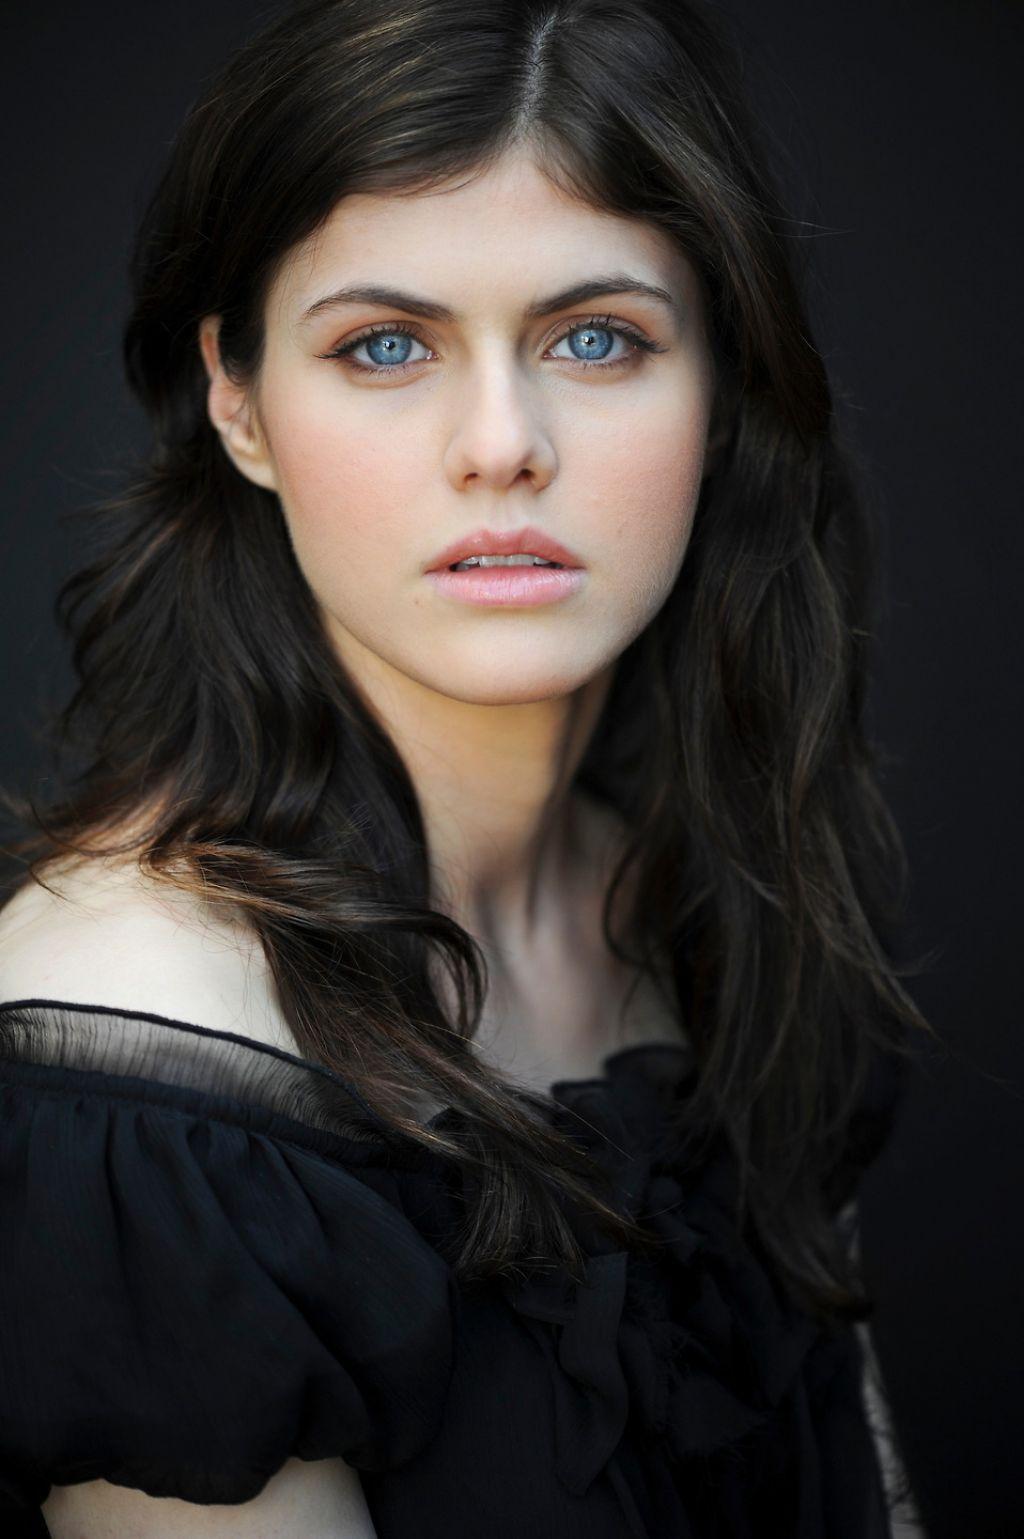 Georgina Cates (born 1975)